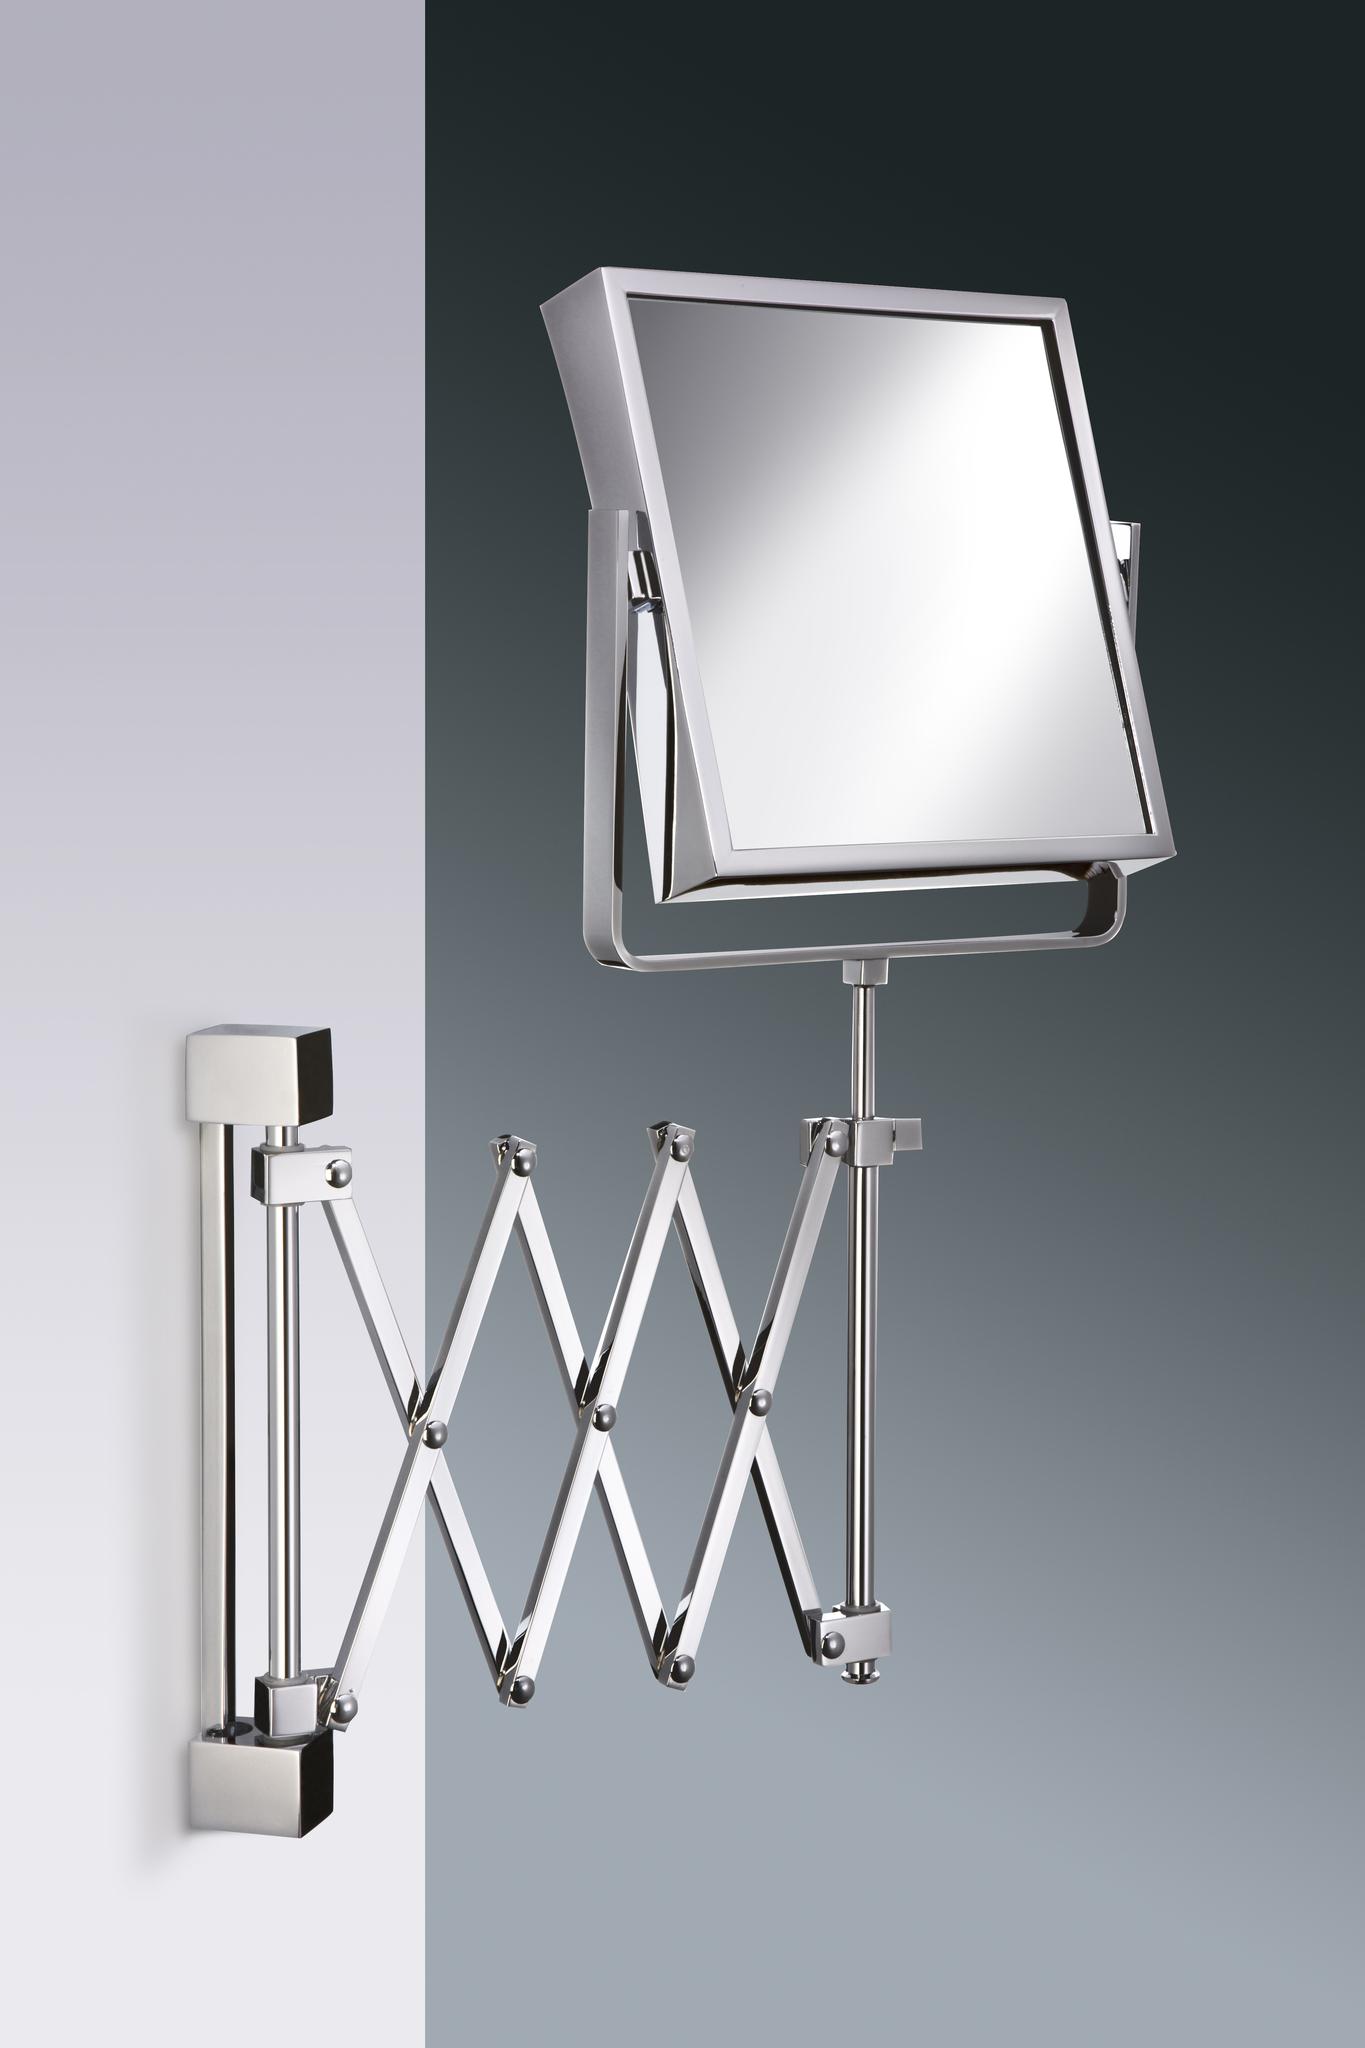 Зеркала Элитное зеркало косметическое 99348CR 5X от Windisch elitnoe-zerkalo-kosmeticheskoe-99348-ot-windisch-ispaniya.jpg